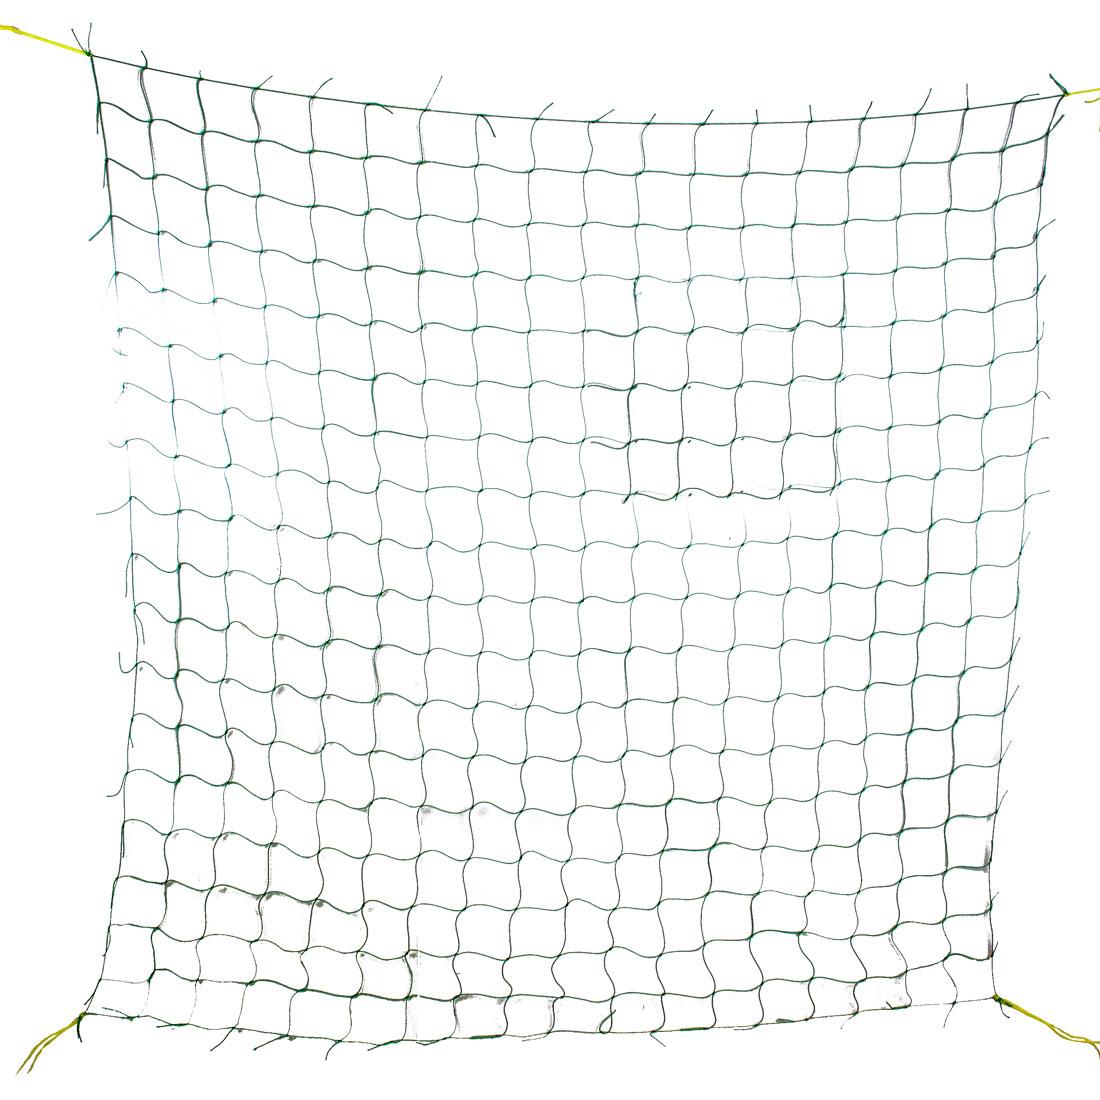 Gardening Practical Helpful Green Nylon Plants Climbing Fishnets 1.4m x 1m